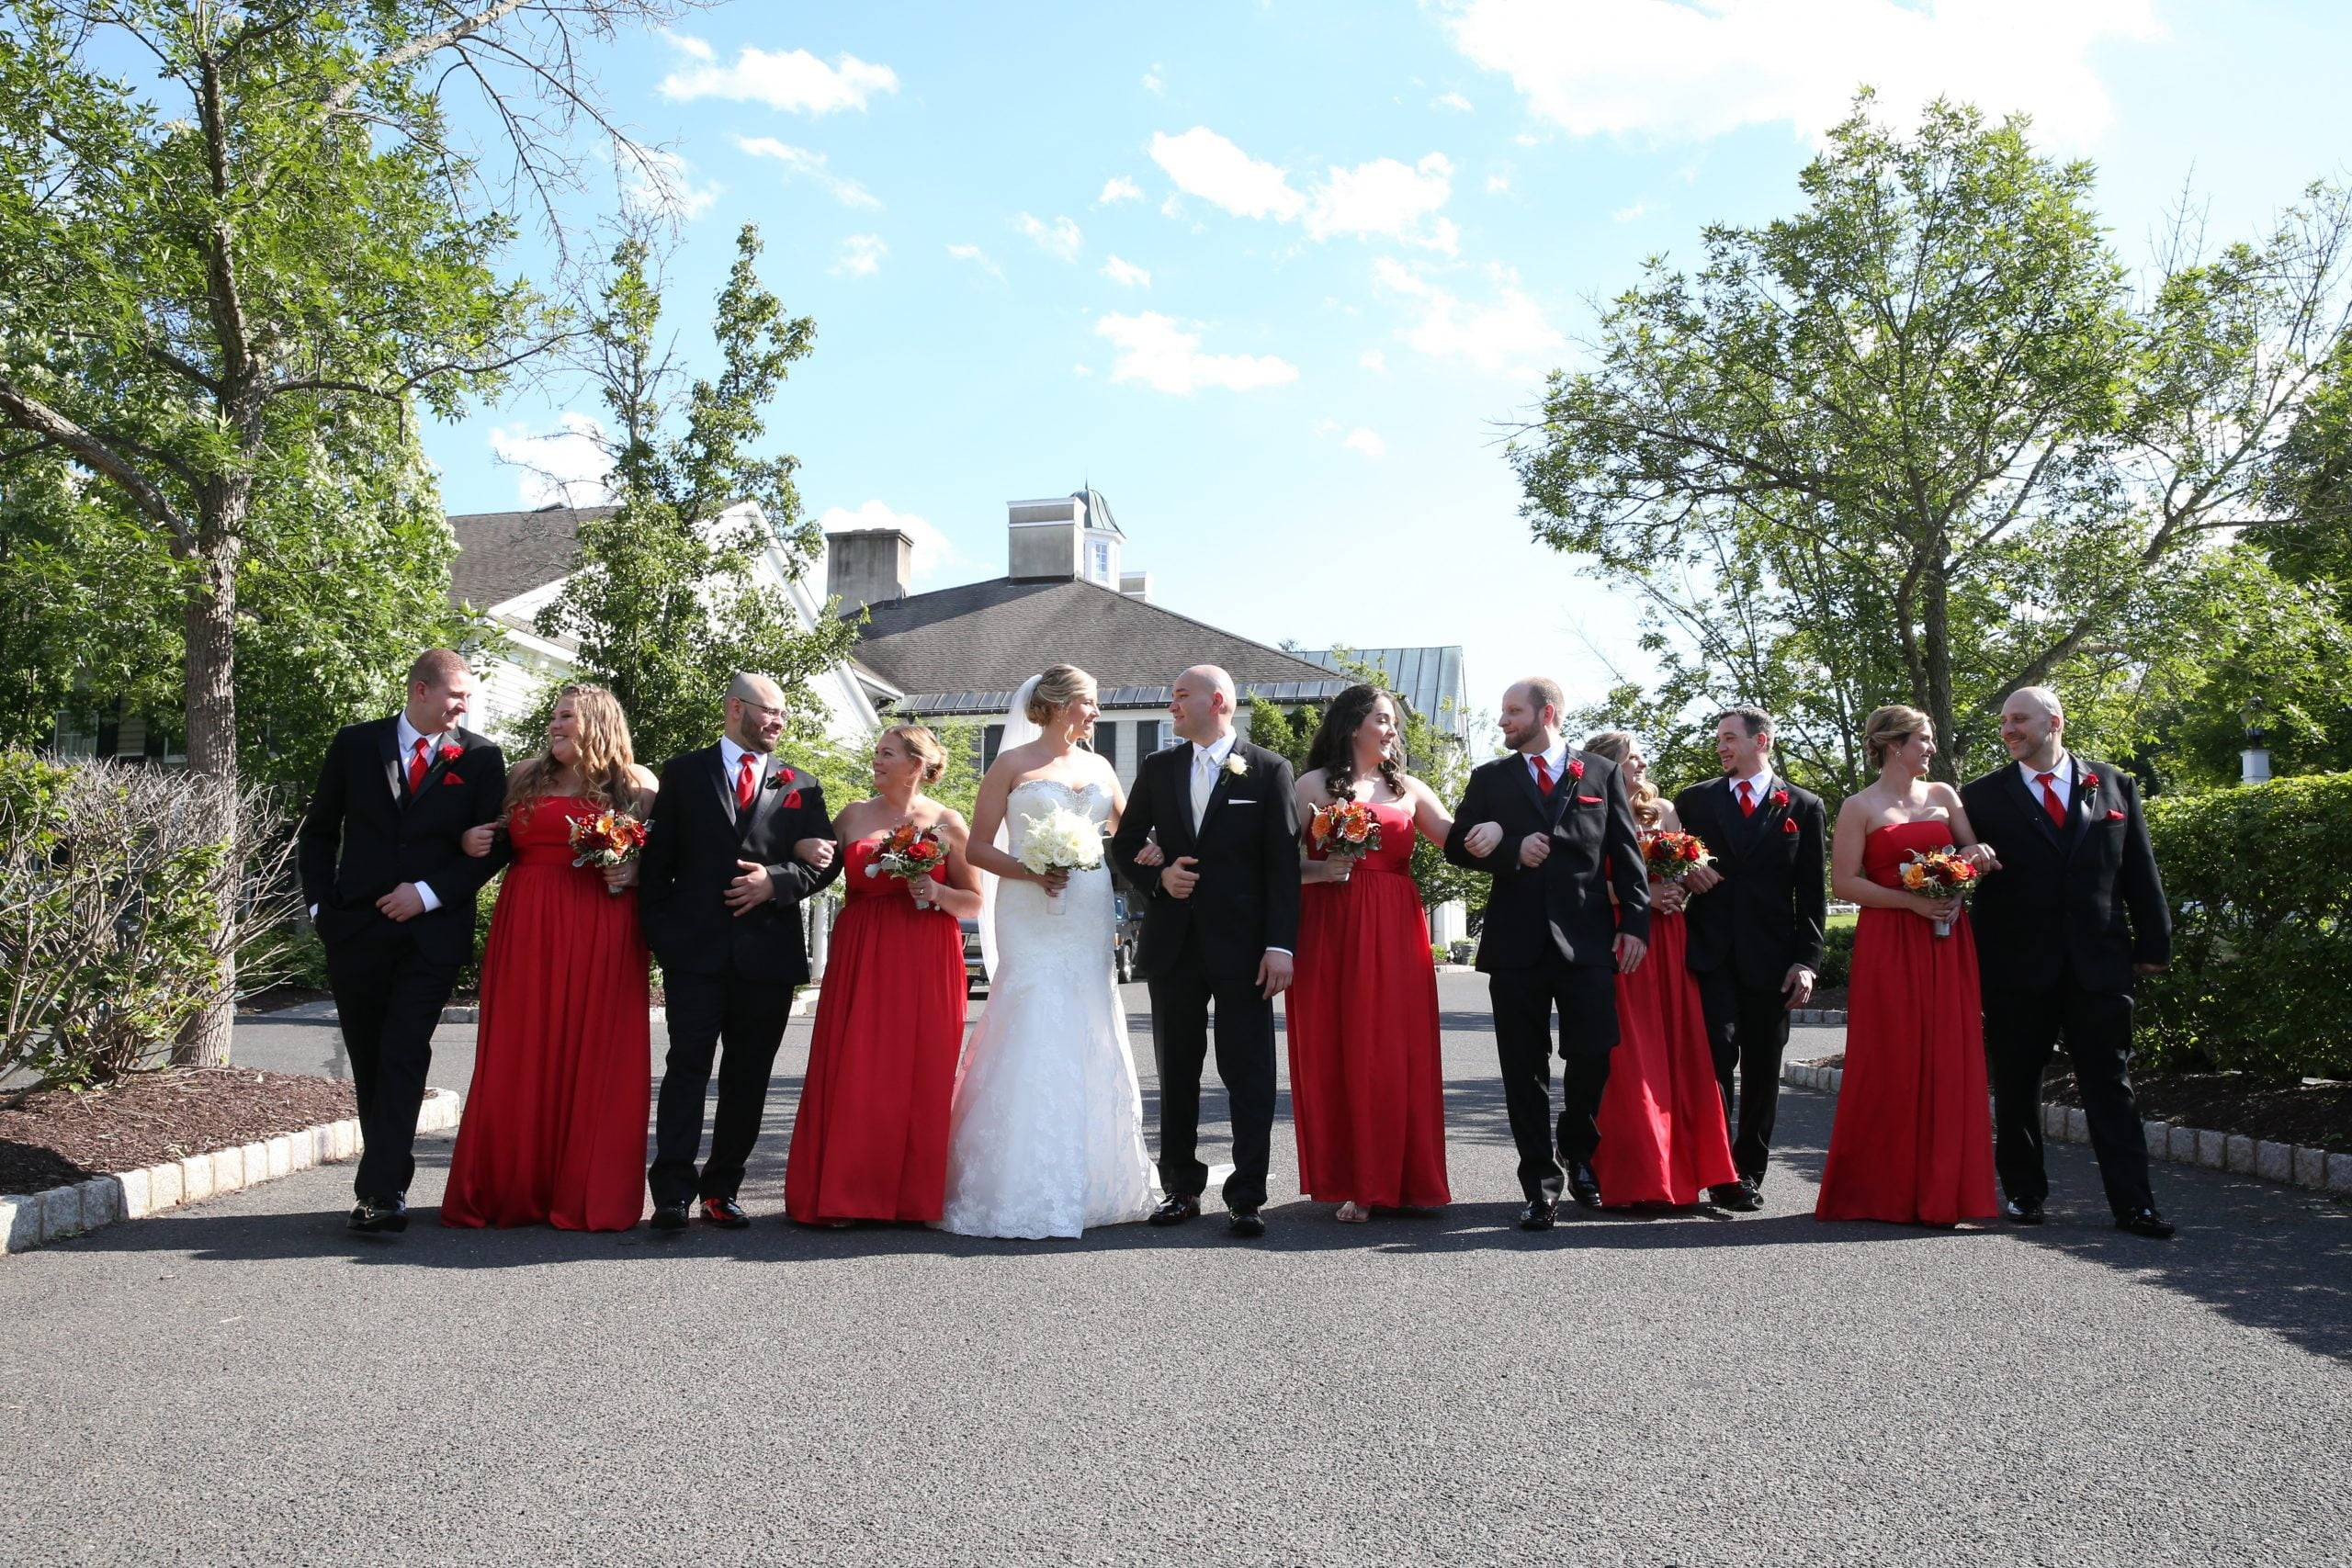 Olde Mill Inn wedding party